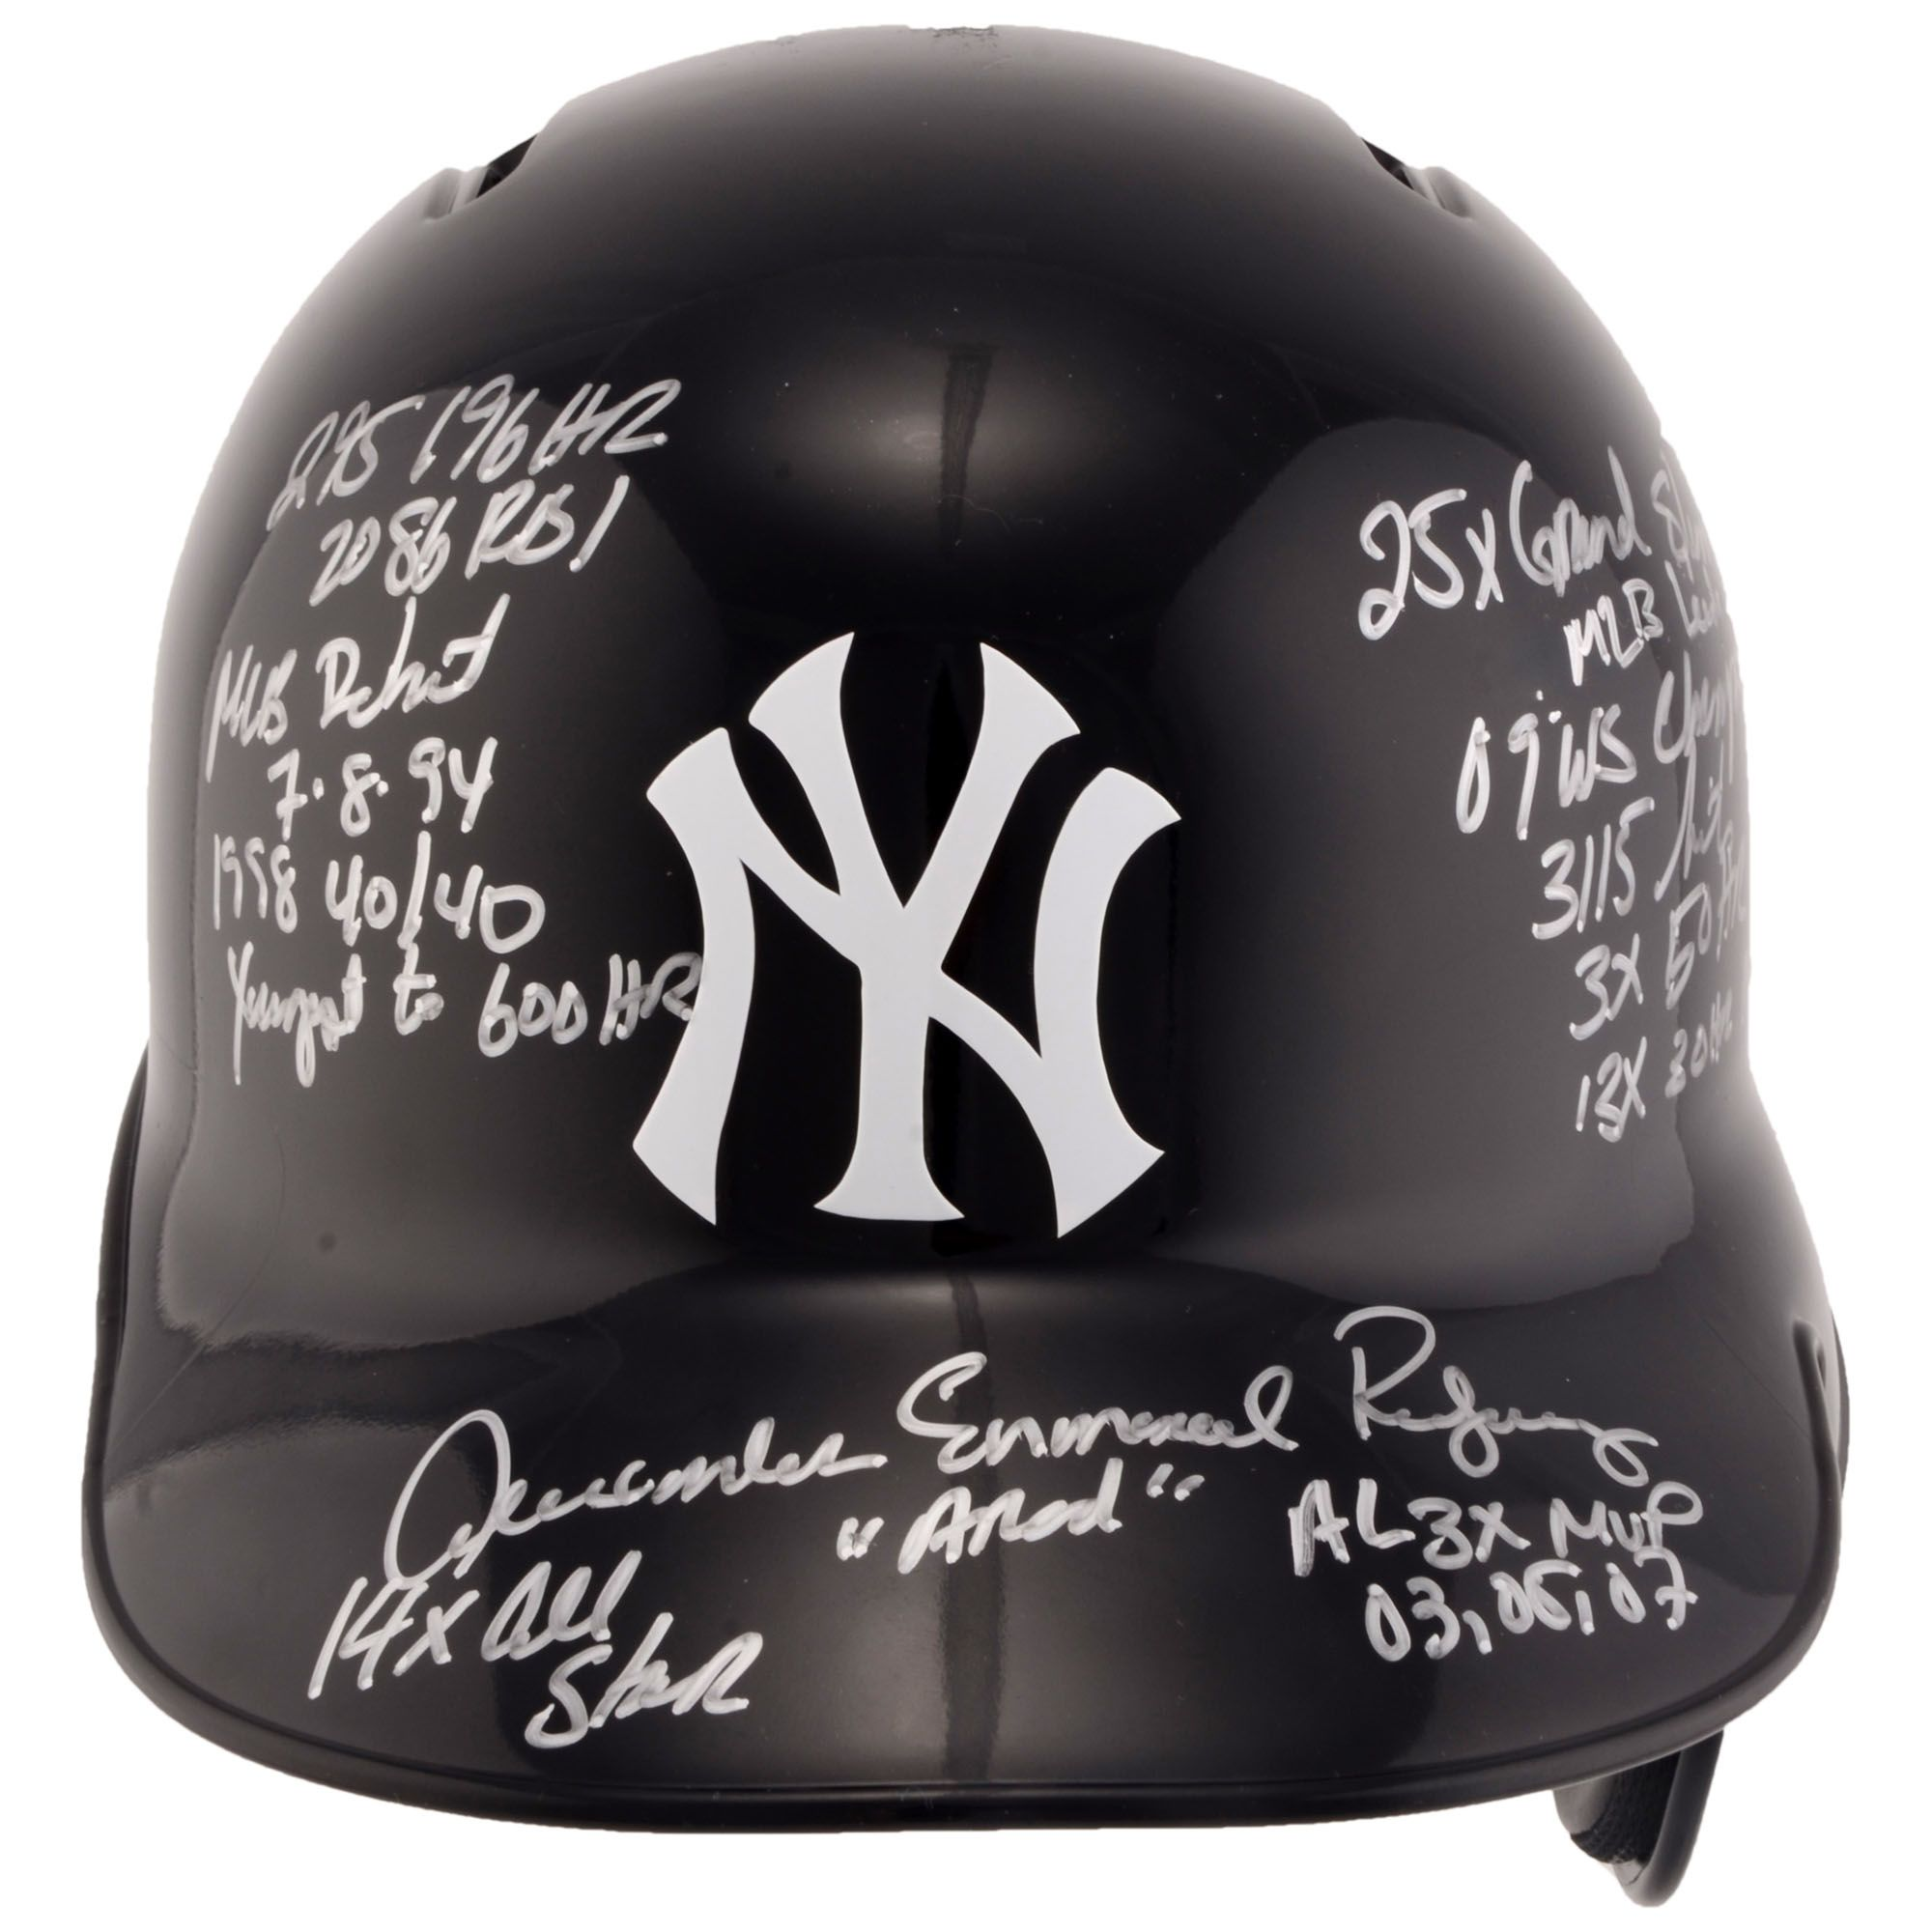 Mlb Alex Rodriguez New York Yankees Fanatics Authentic Autographed Replica Batting Helmet With Career Stats Insc Batting Helmet New York Yankees Alex Rodriguez